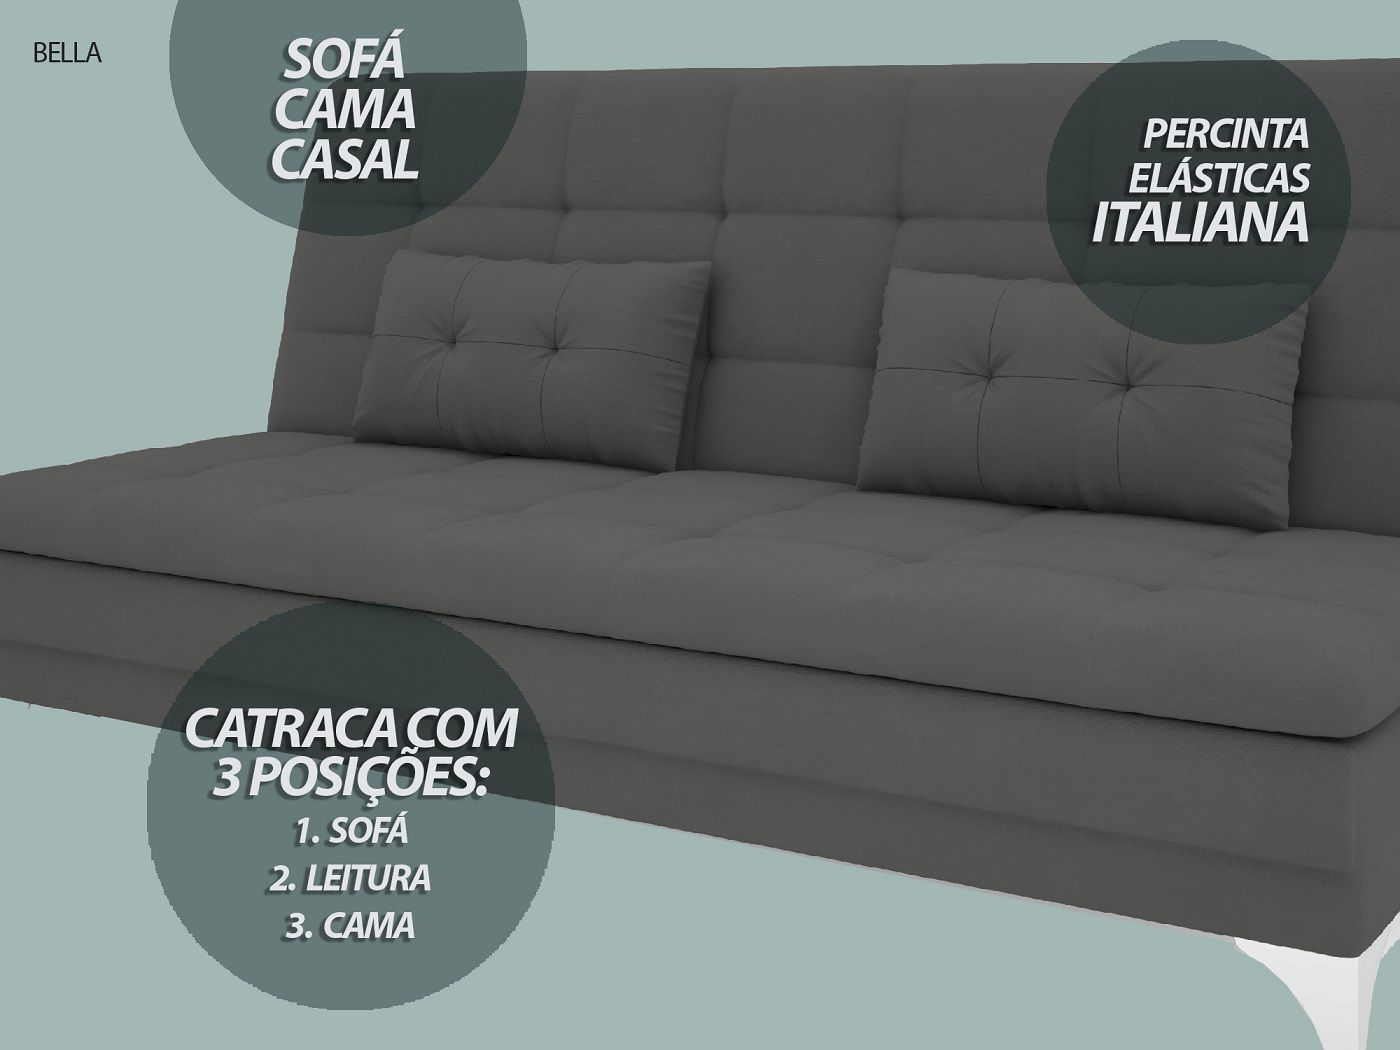 Sofá-Cama Casal New Bella 1,87m Velosuede Grafite - NETSOFAS